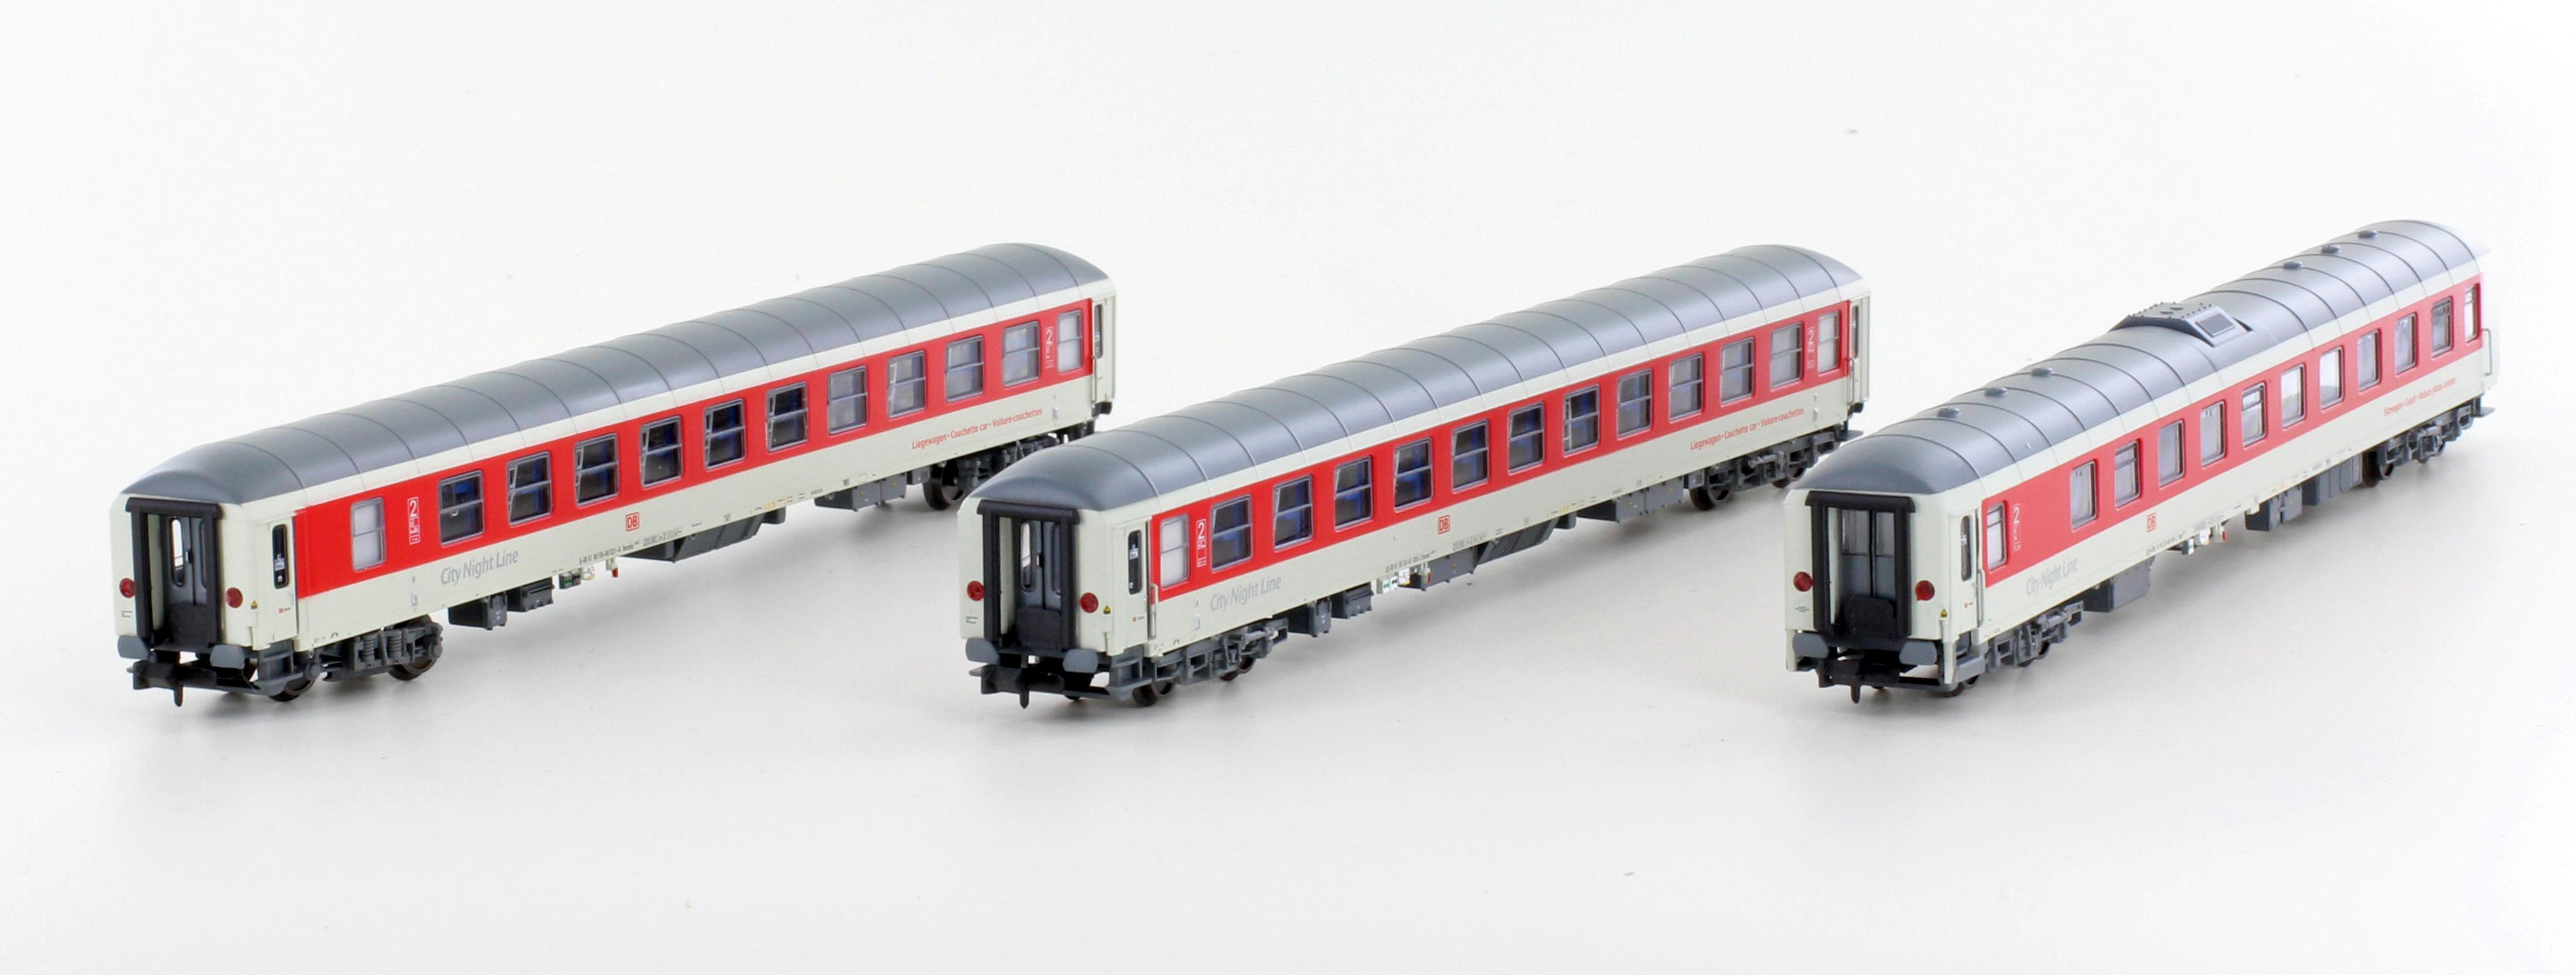 LS79054